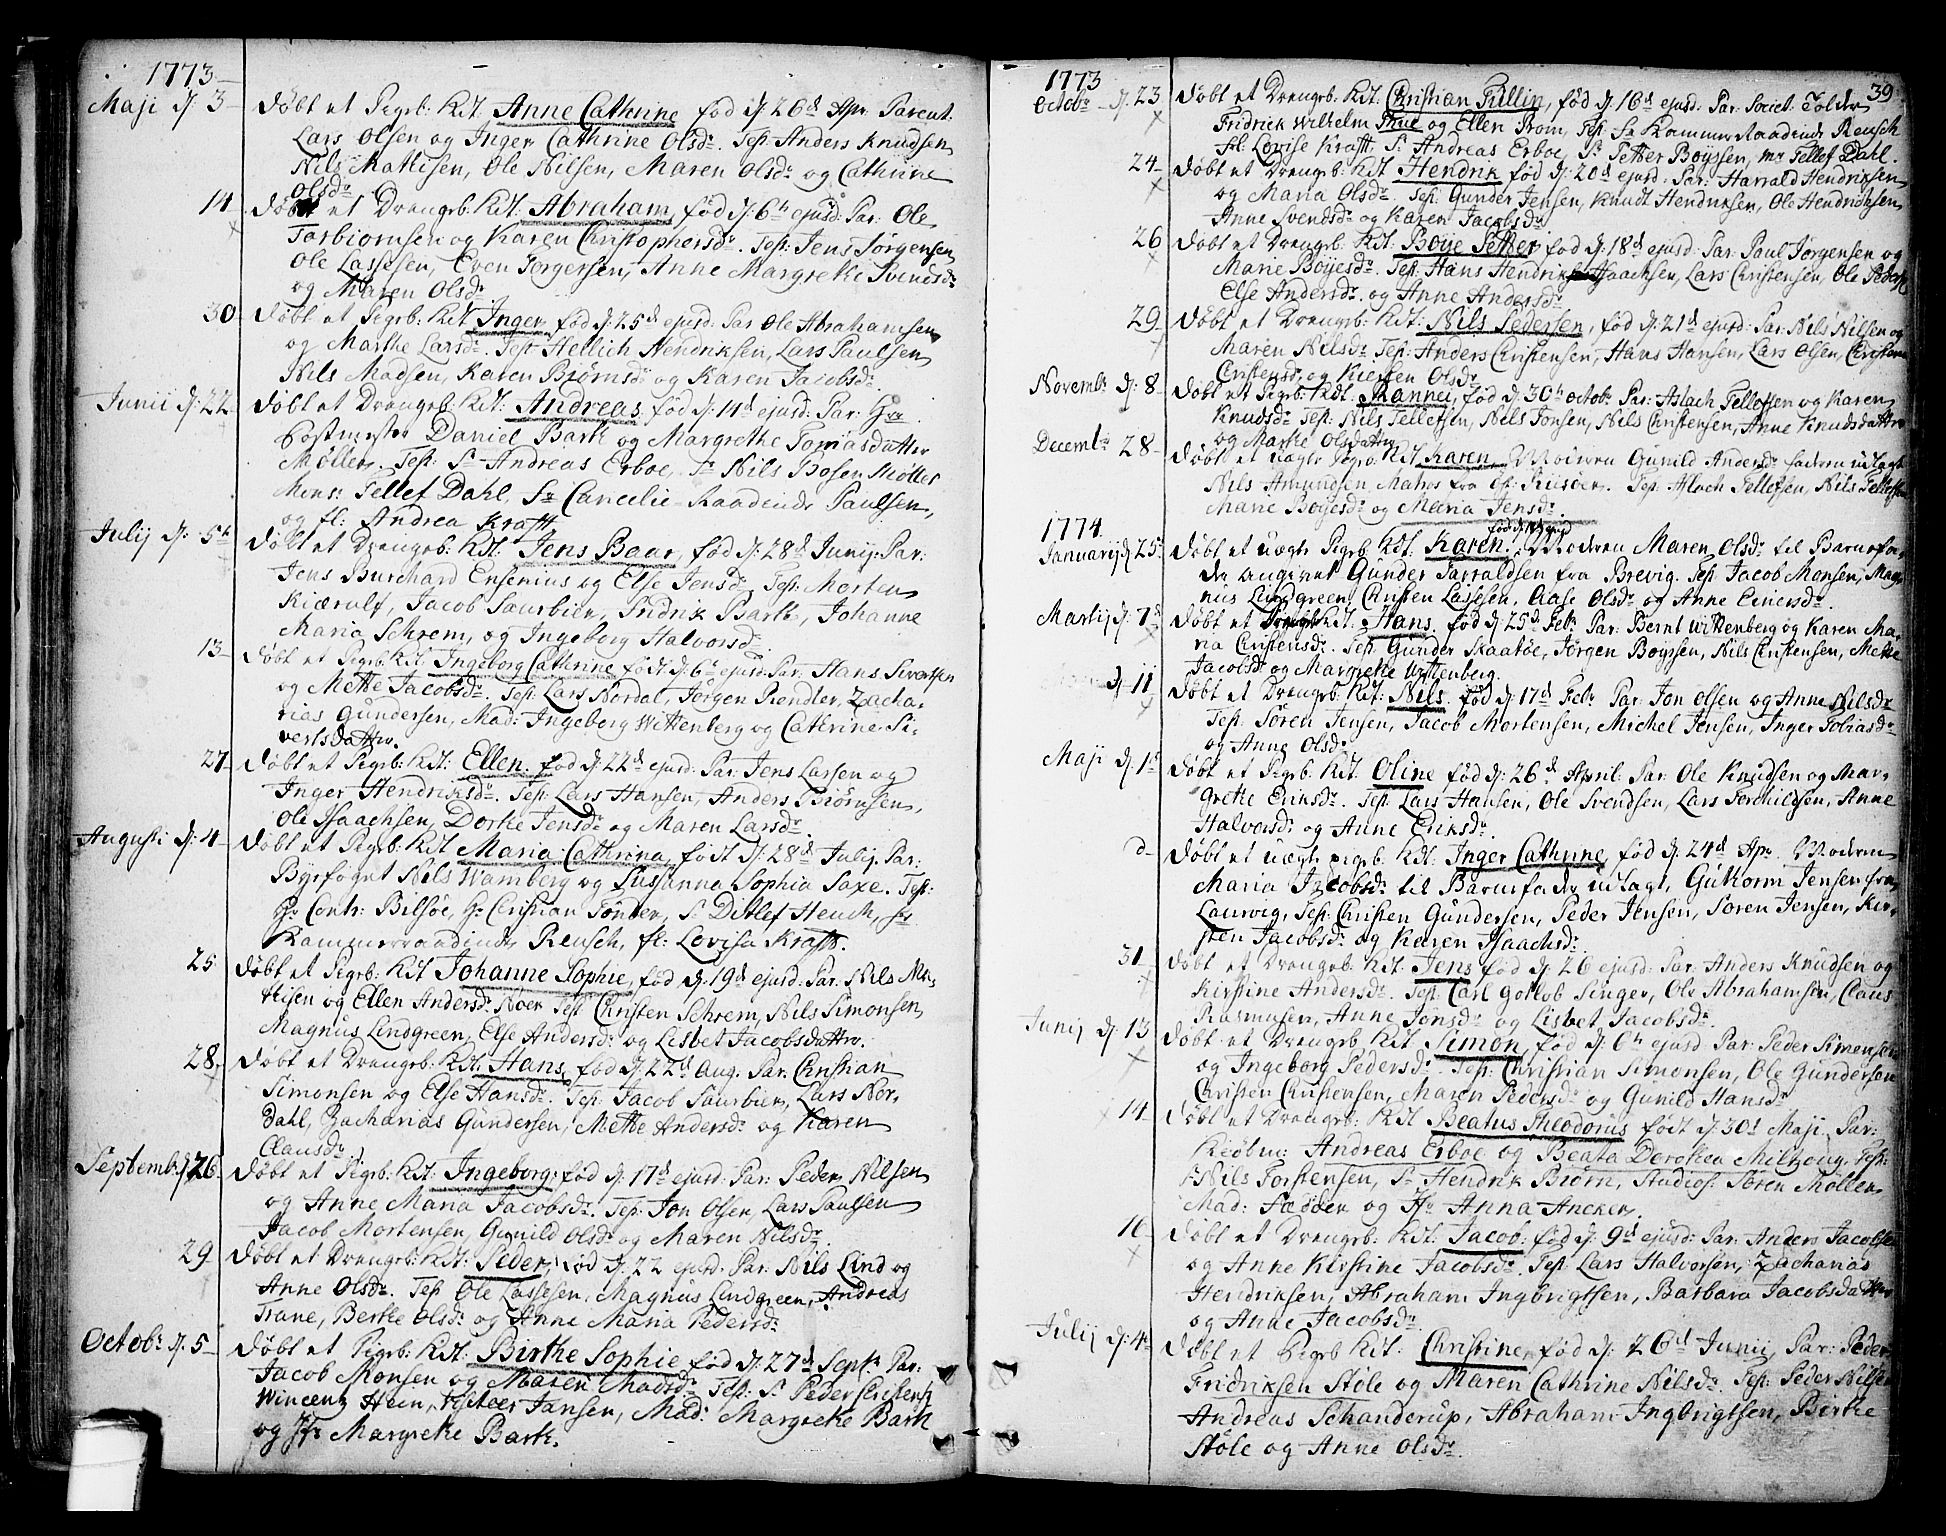 SAKO, Kragerø kirkebøker, F/Fa/L0002: Ministerialbok nr. 2, 1767-1802, s. 39